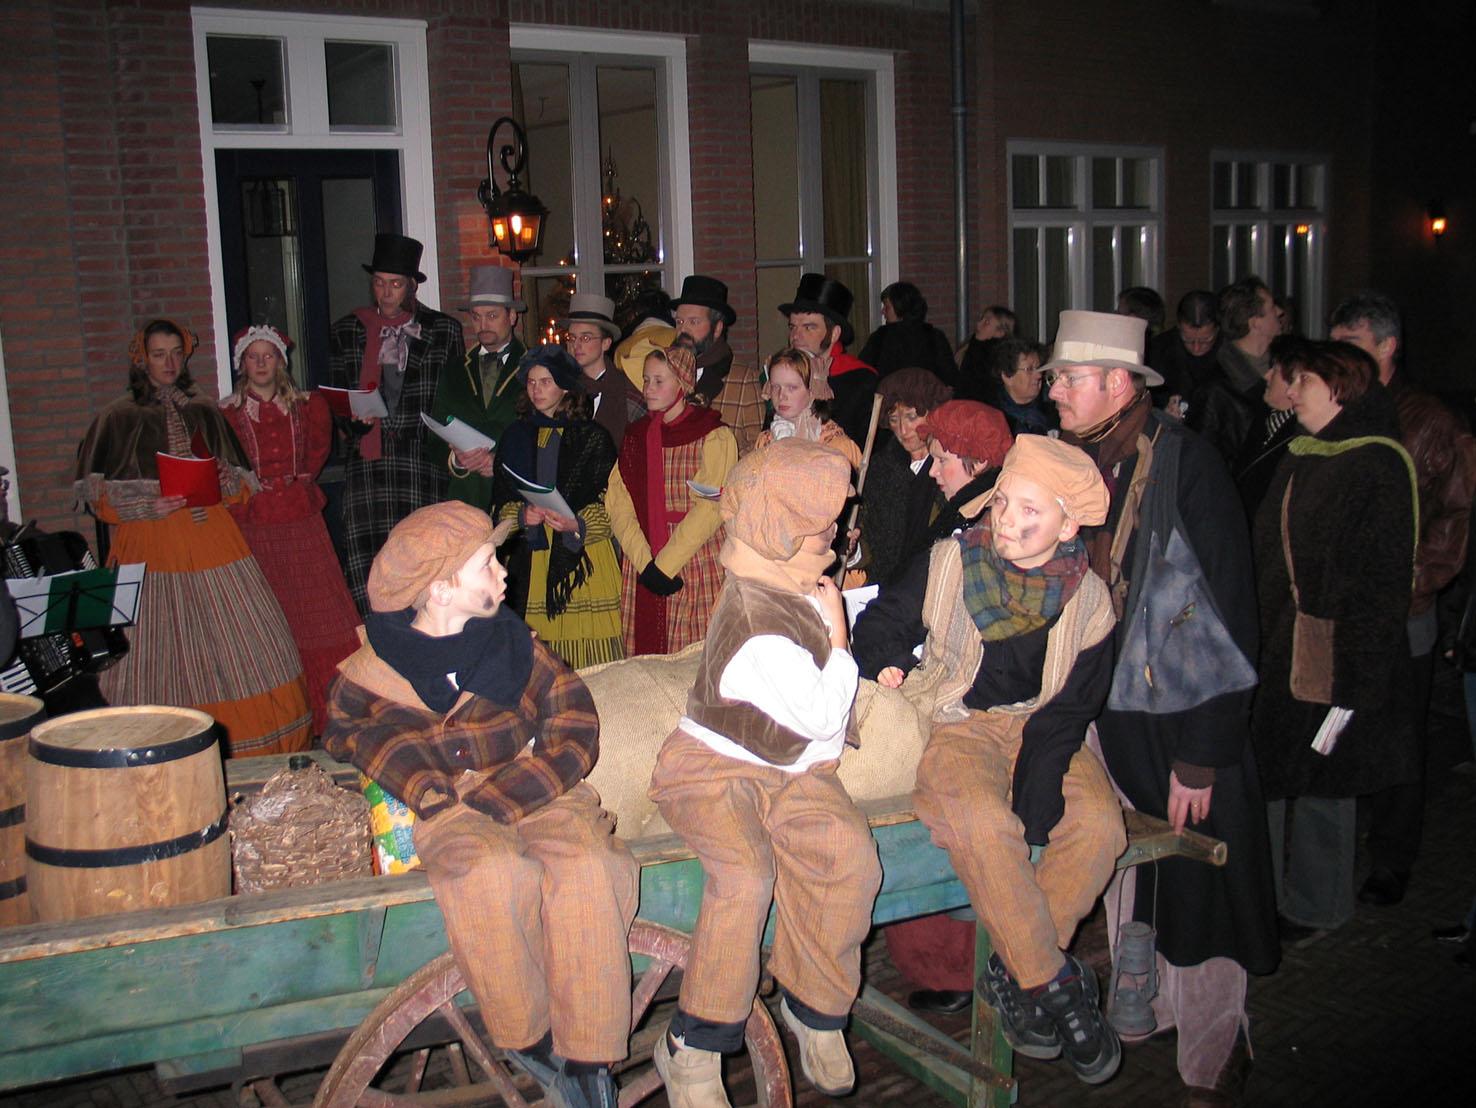 087 - Kerstmarkt Helmond 2003.jpg